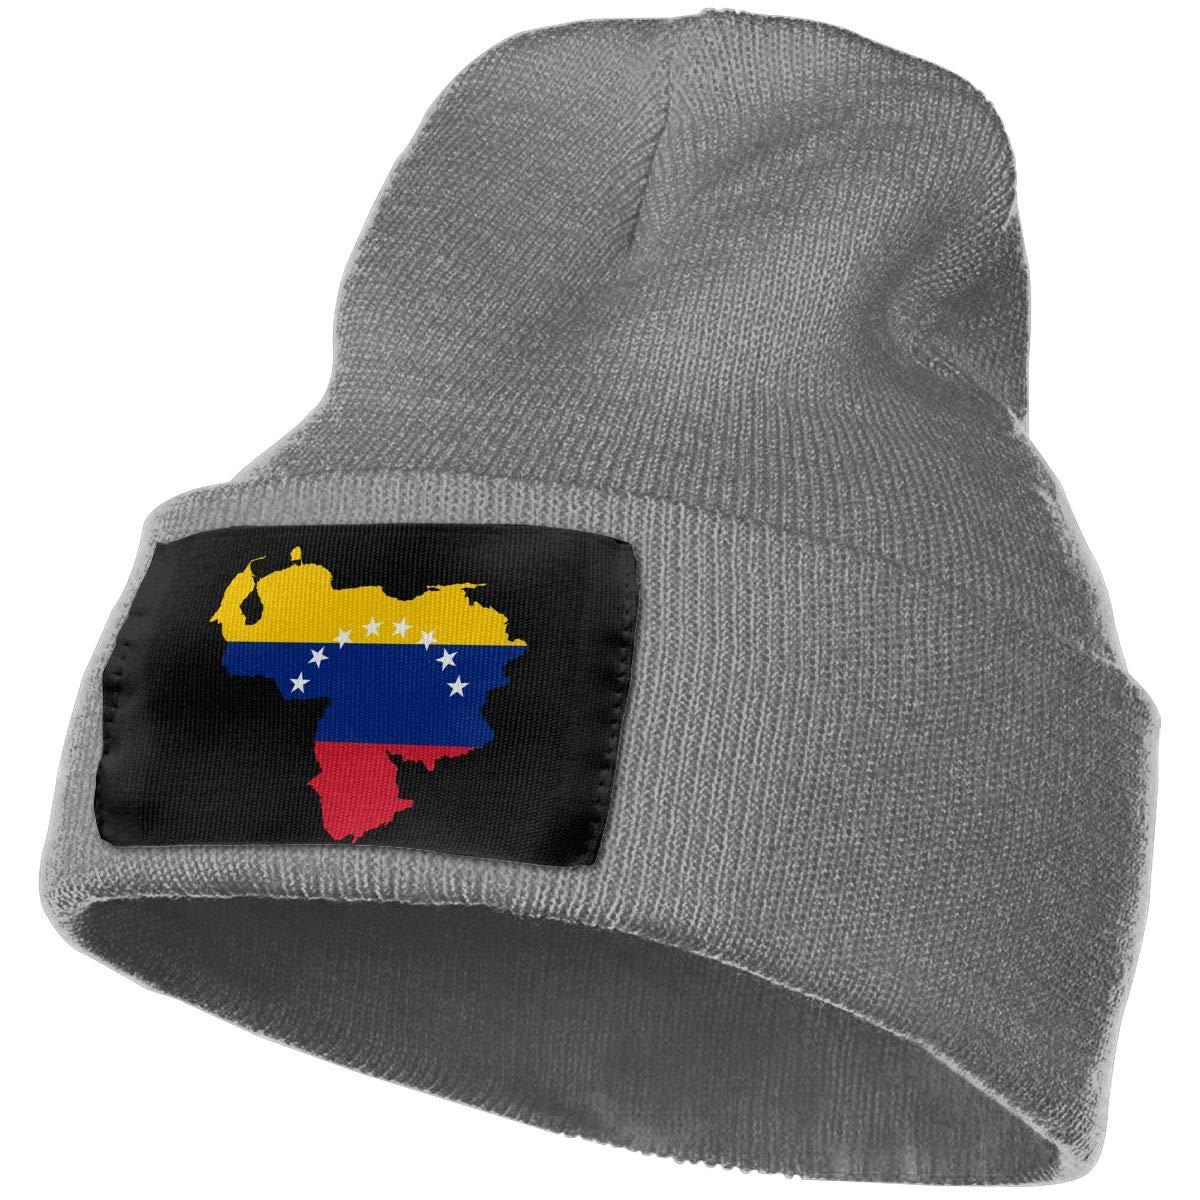 SLADDD1 Flag of Venezuela Warm Winter Hat Knit Beanie Skull Cap Cuff Beanie Hat Winter Hats for Men /& Women